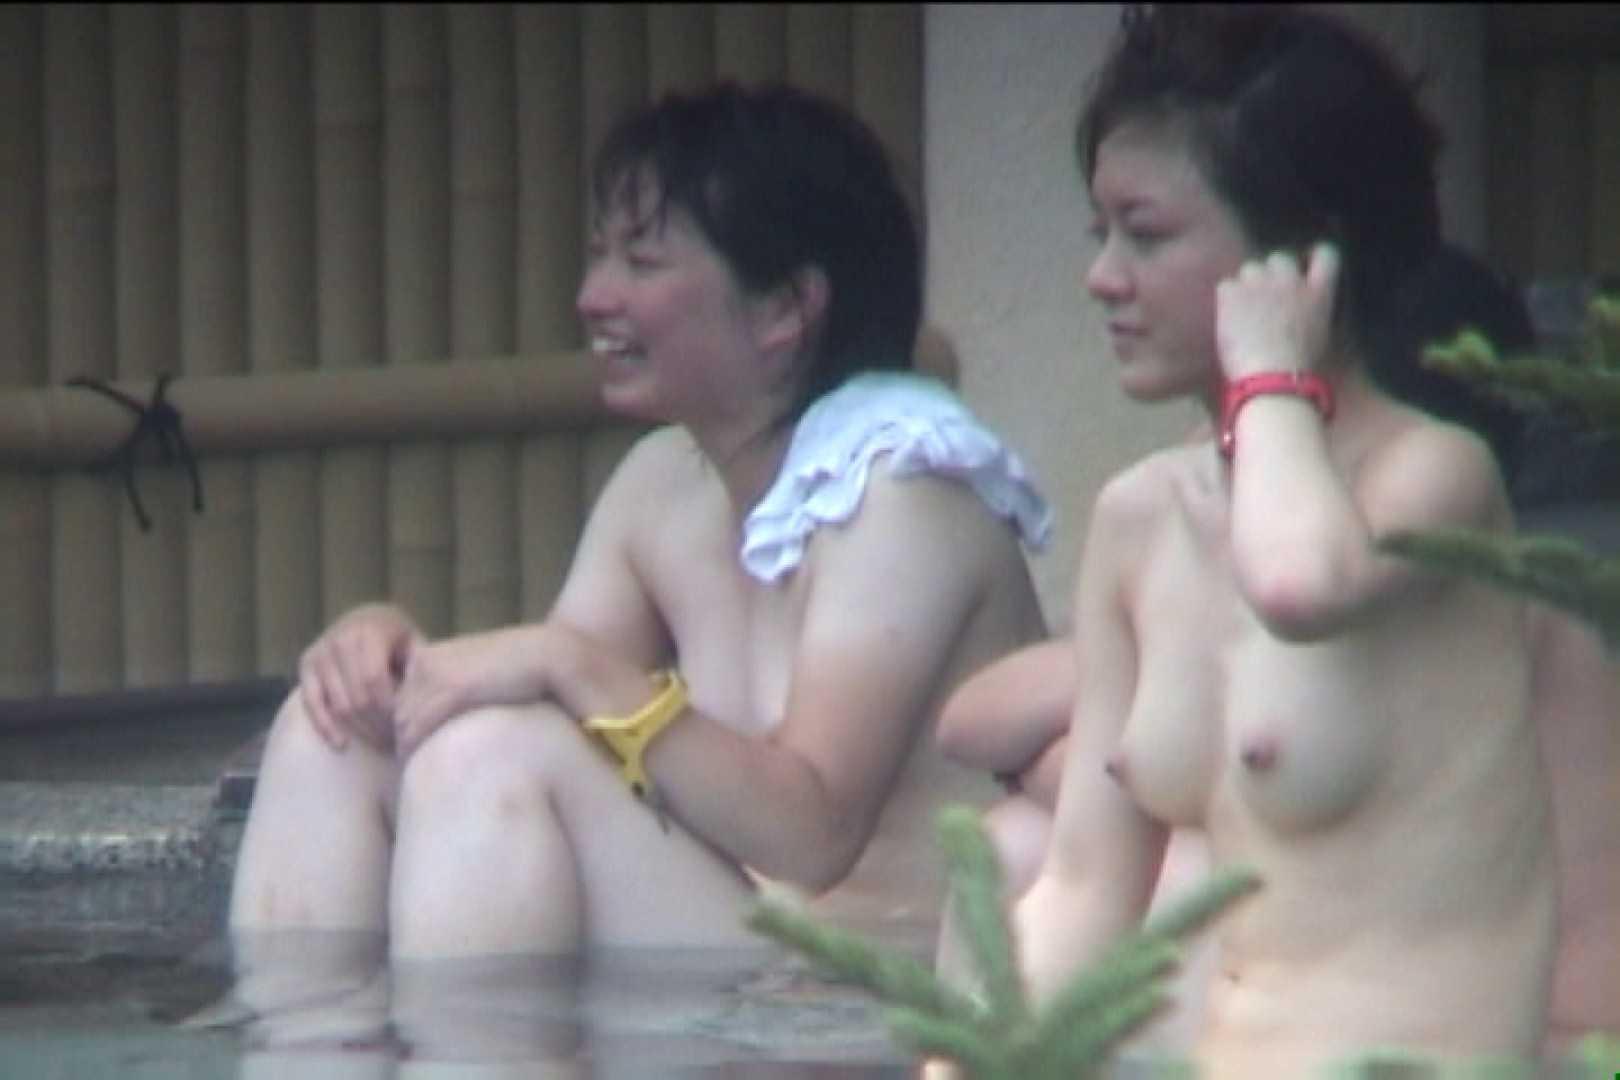 Aquaな露天風呂Vol.94【VIP限定】 盗撮シリーズ | 露天風呂編  111PIX 15